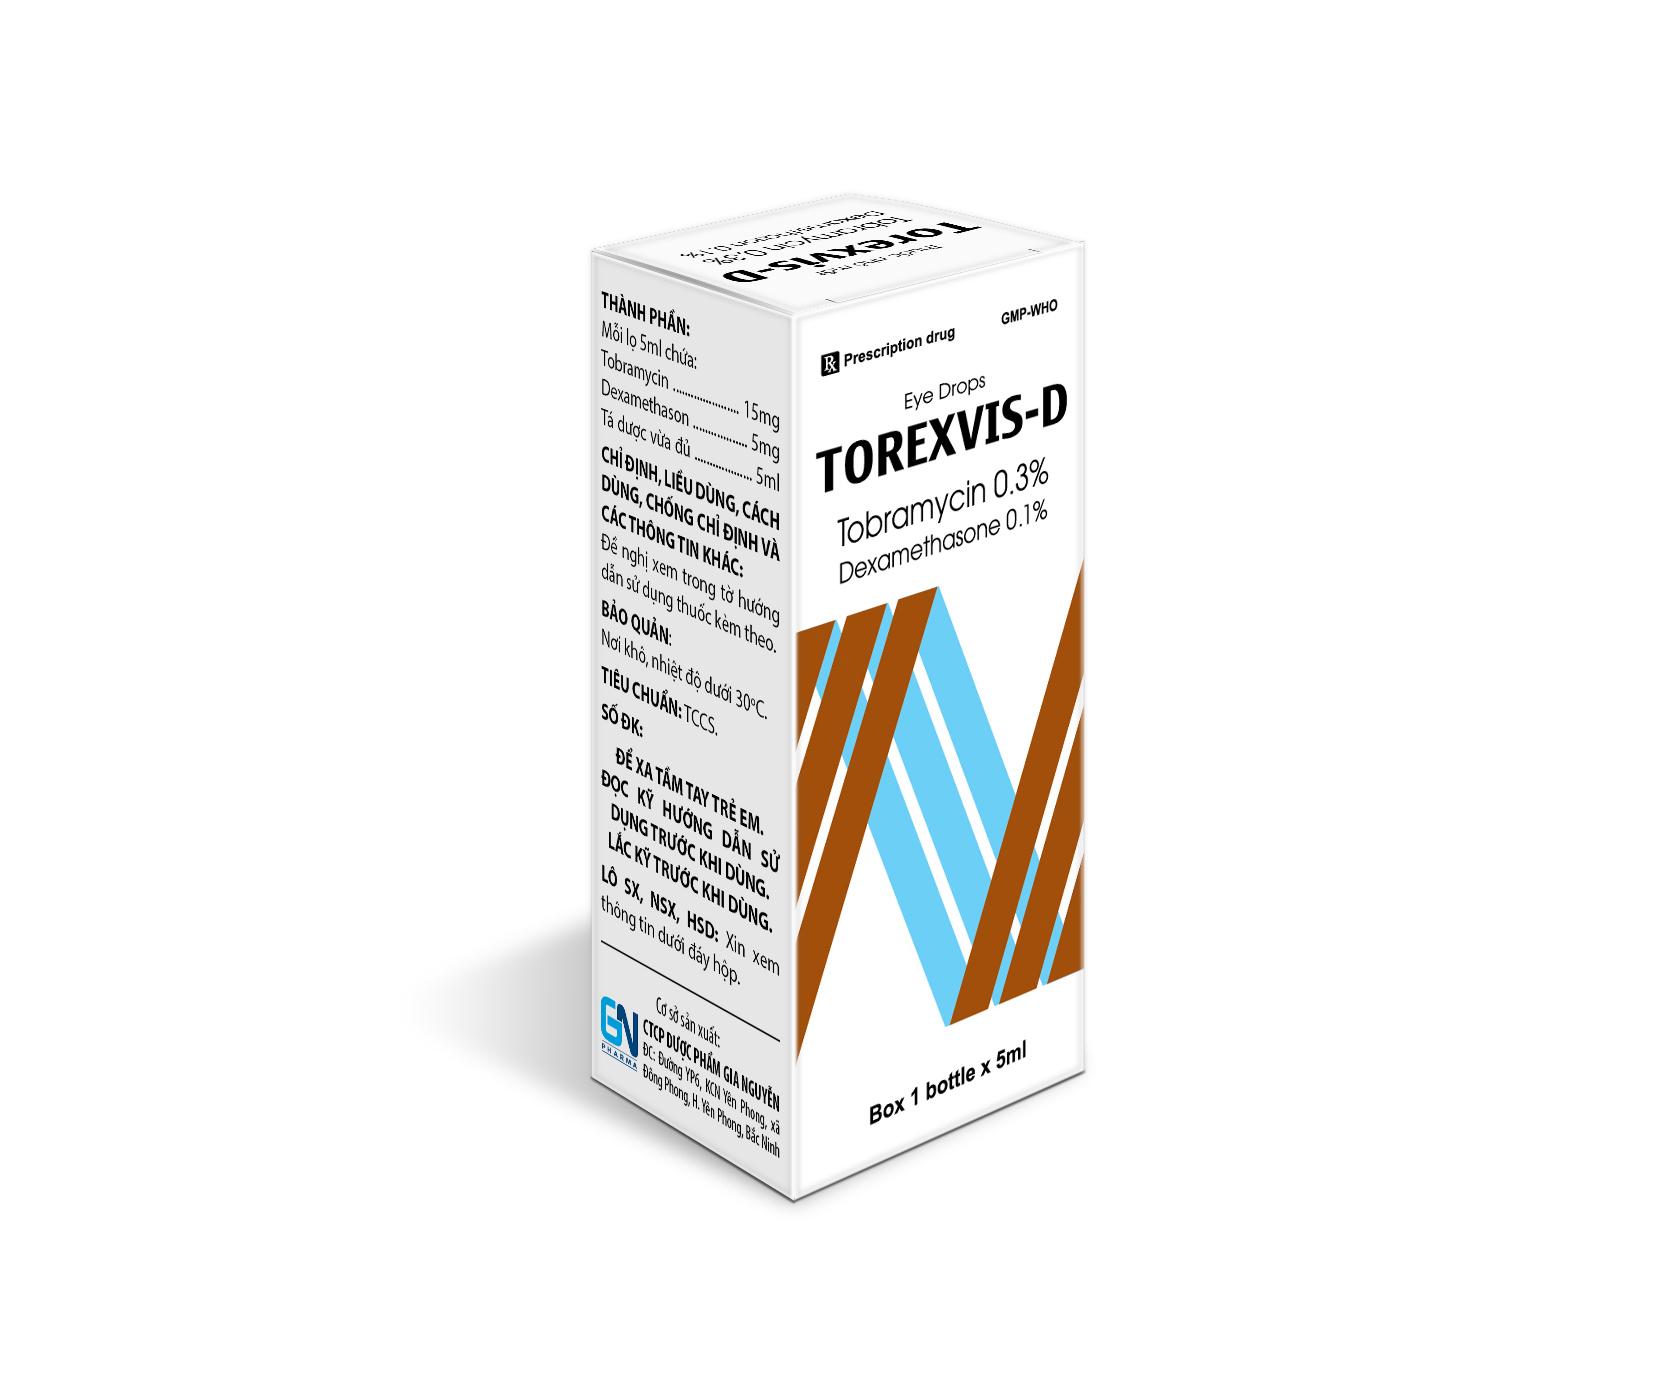 Thuốc nhỏ mắt Torexvis-D